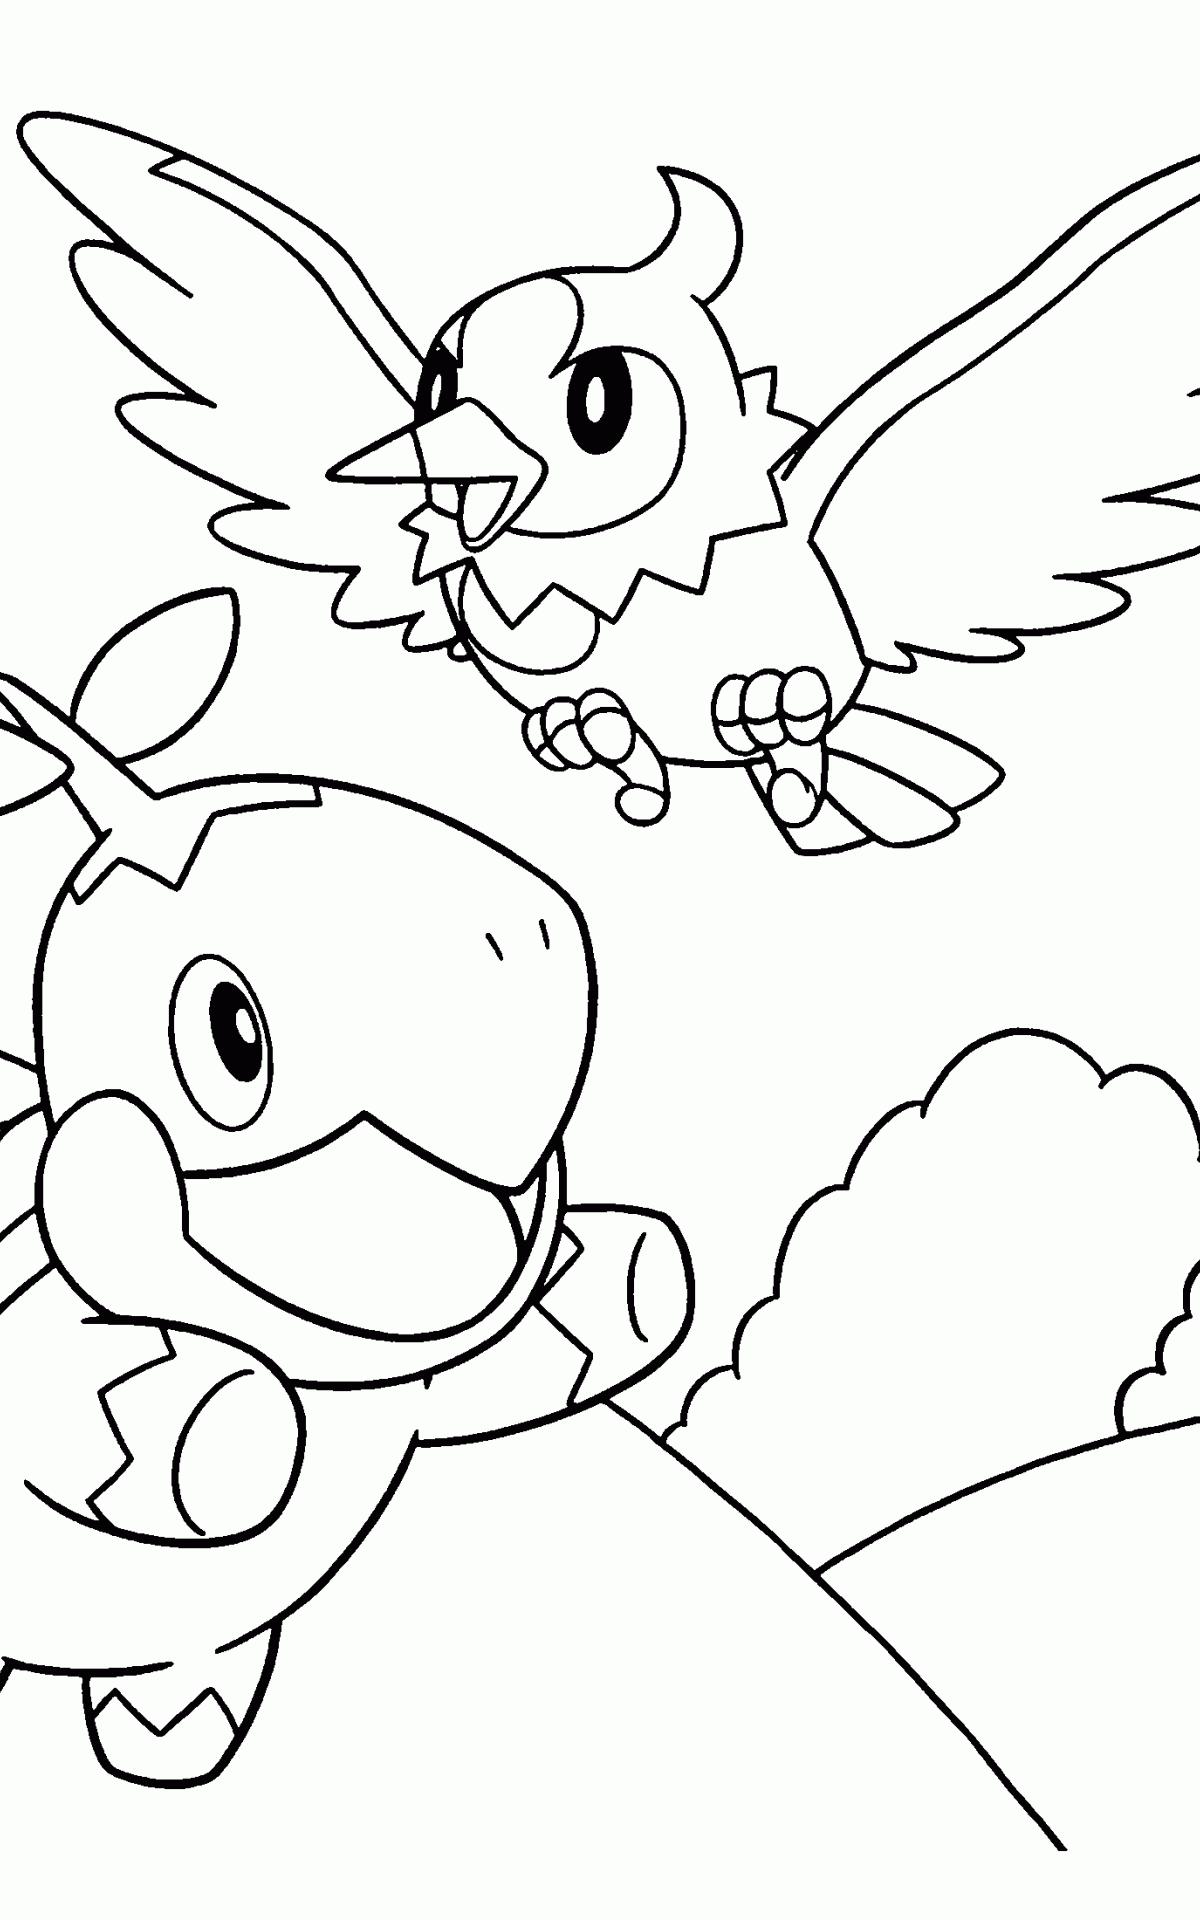 Kleurplaten Pokemon Turtwig.2200x2200px Diamond Vogel Wallpaper Wallpapersafari